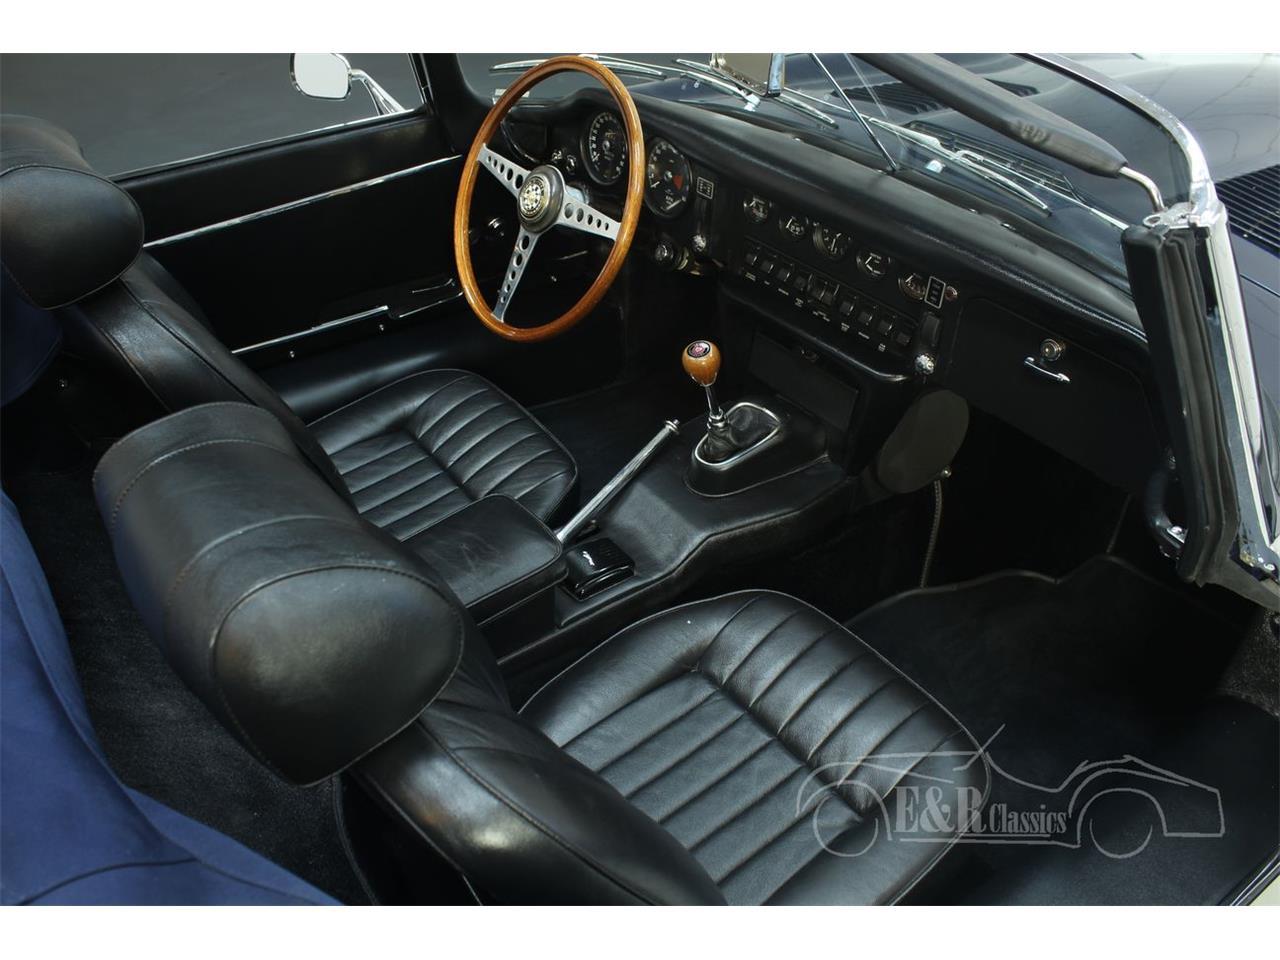 Large Picture of 1969 Jaguar E-Type located in Waalwijk Noord-Brabant - Q45K